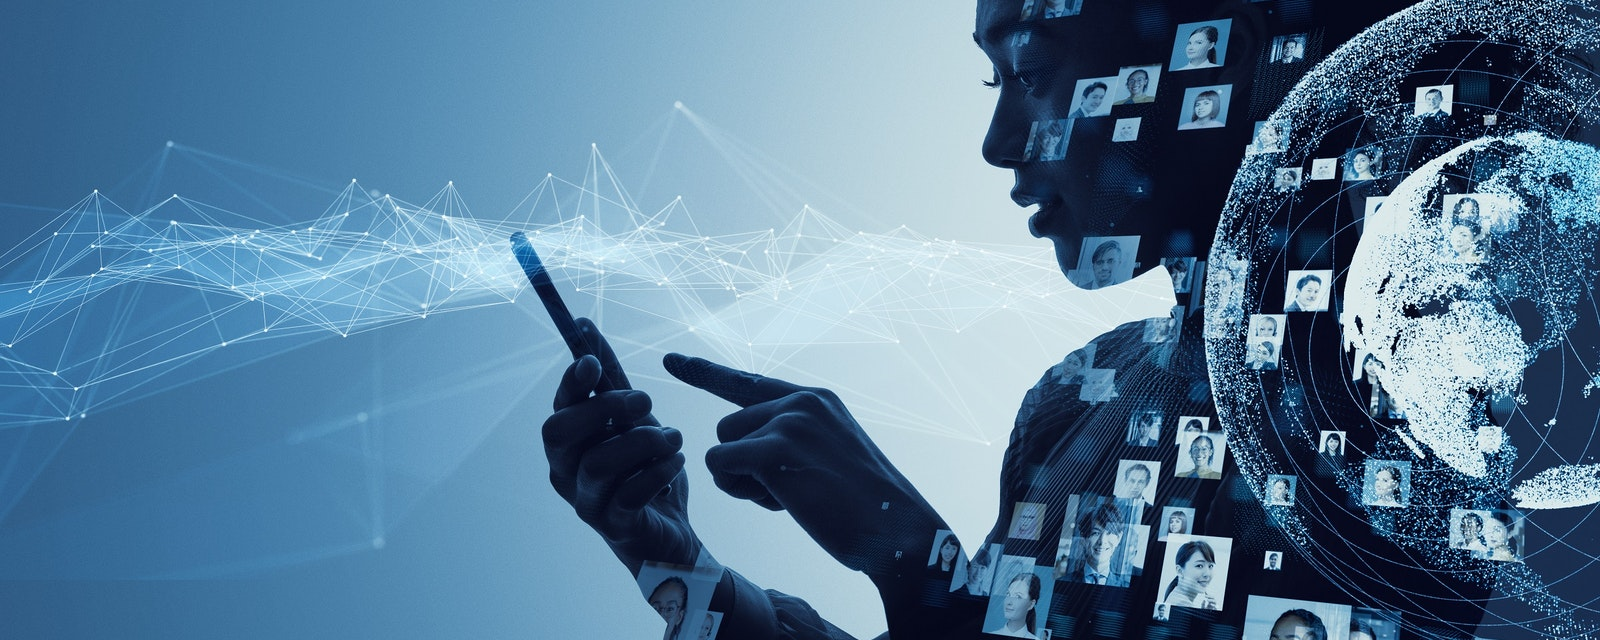 Social,Media,Concept.,Communication,Network.